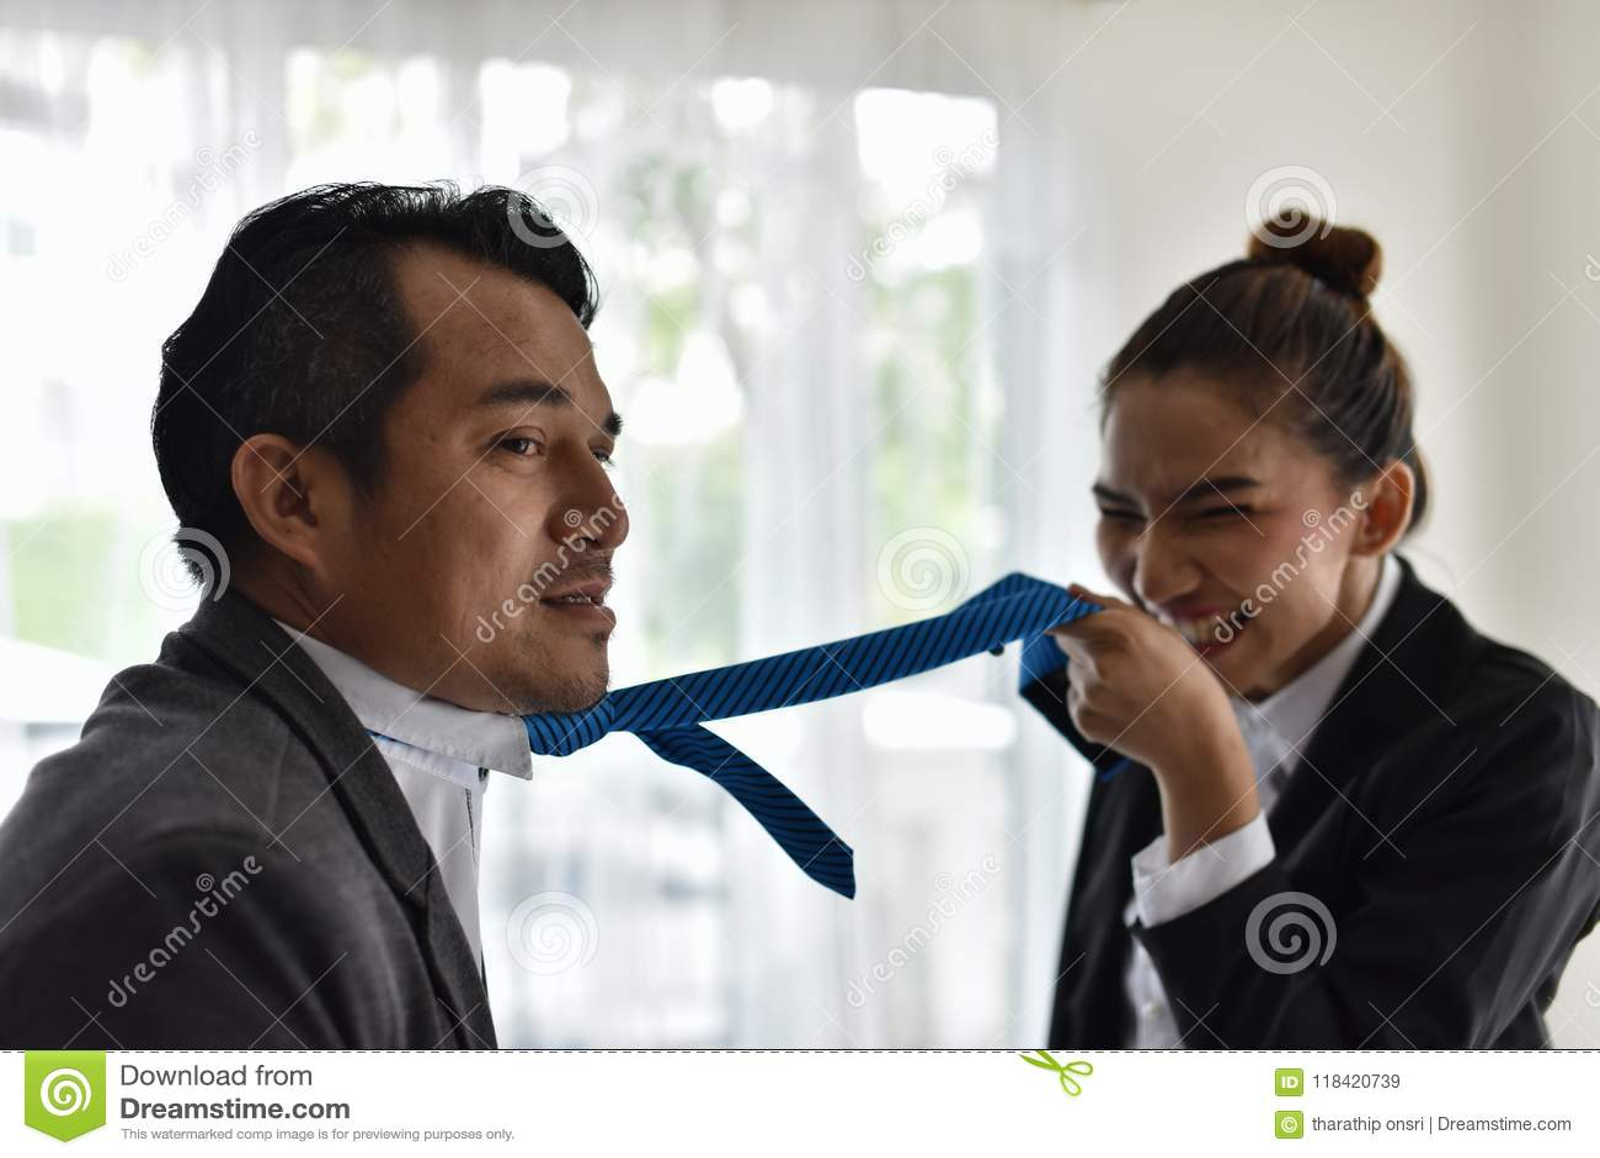 understanding conflict in the workplace